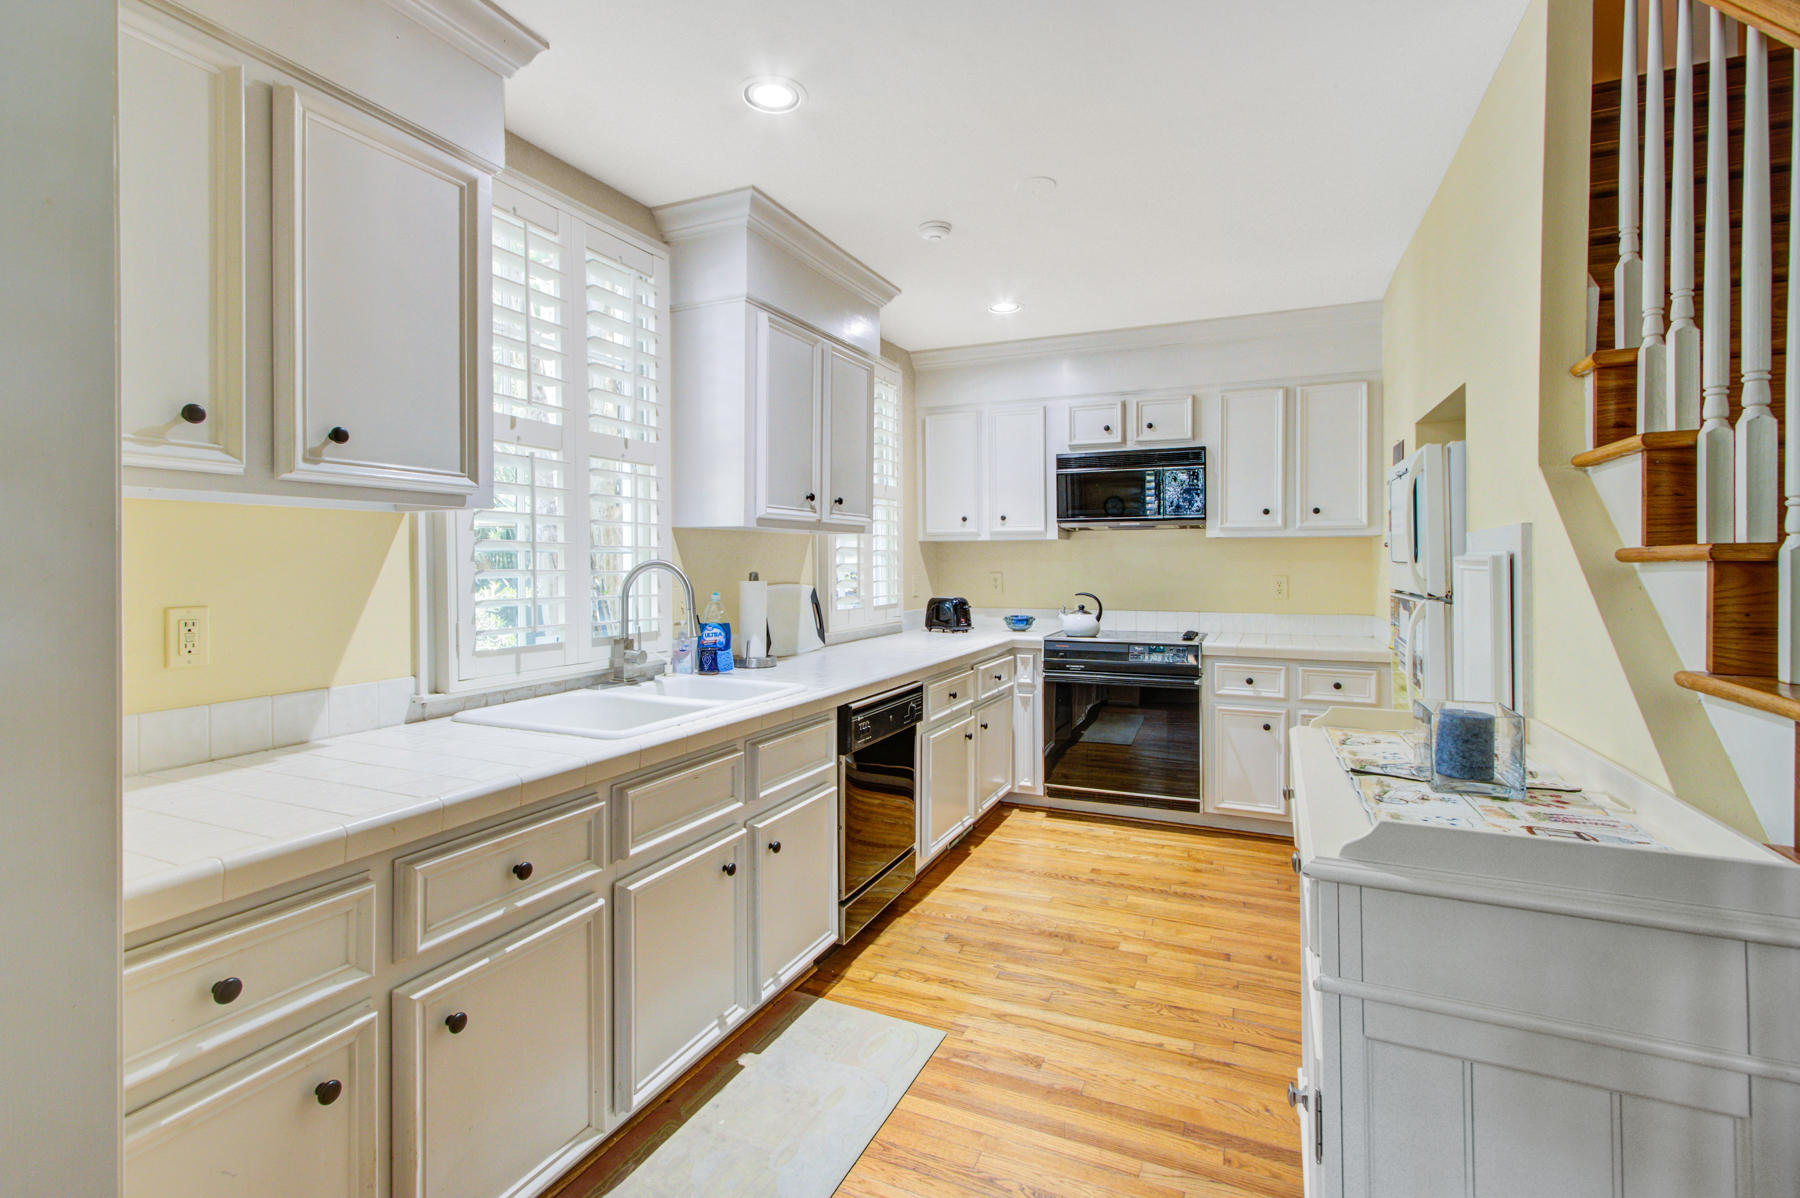 Radcliffeborough Homes For Sale - 48 Radcliffe, Charleston, SC - 7